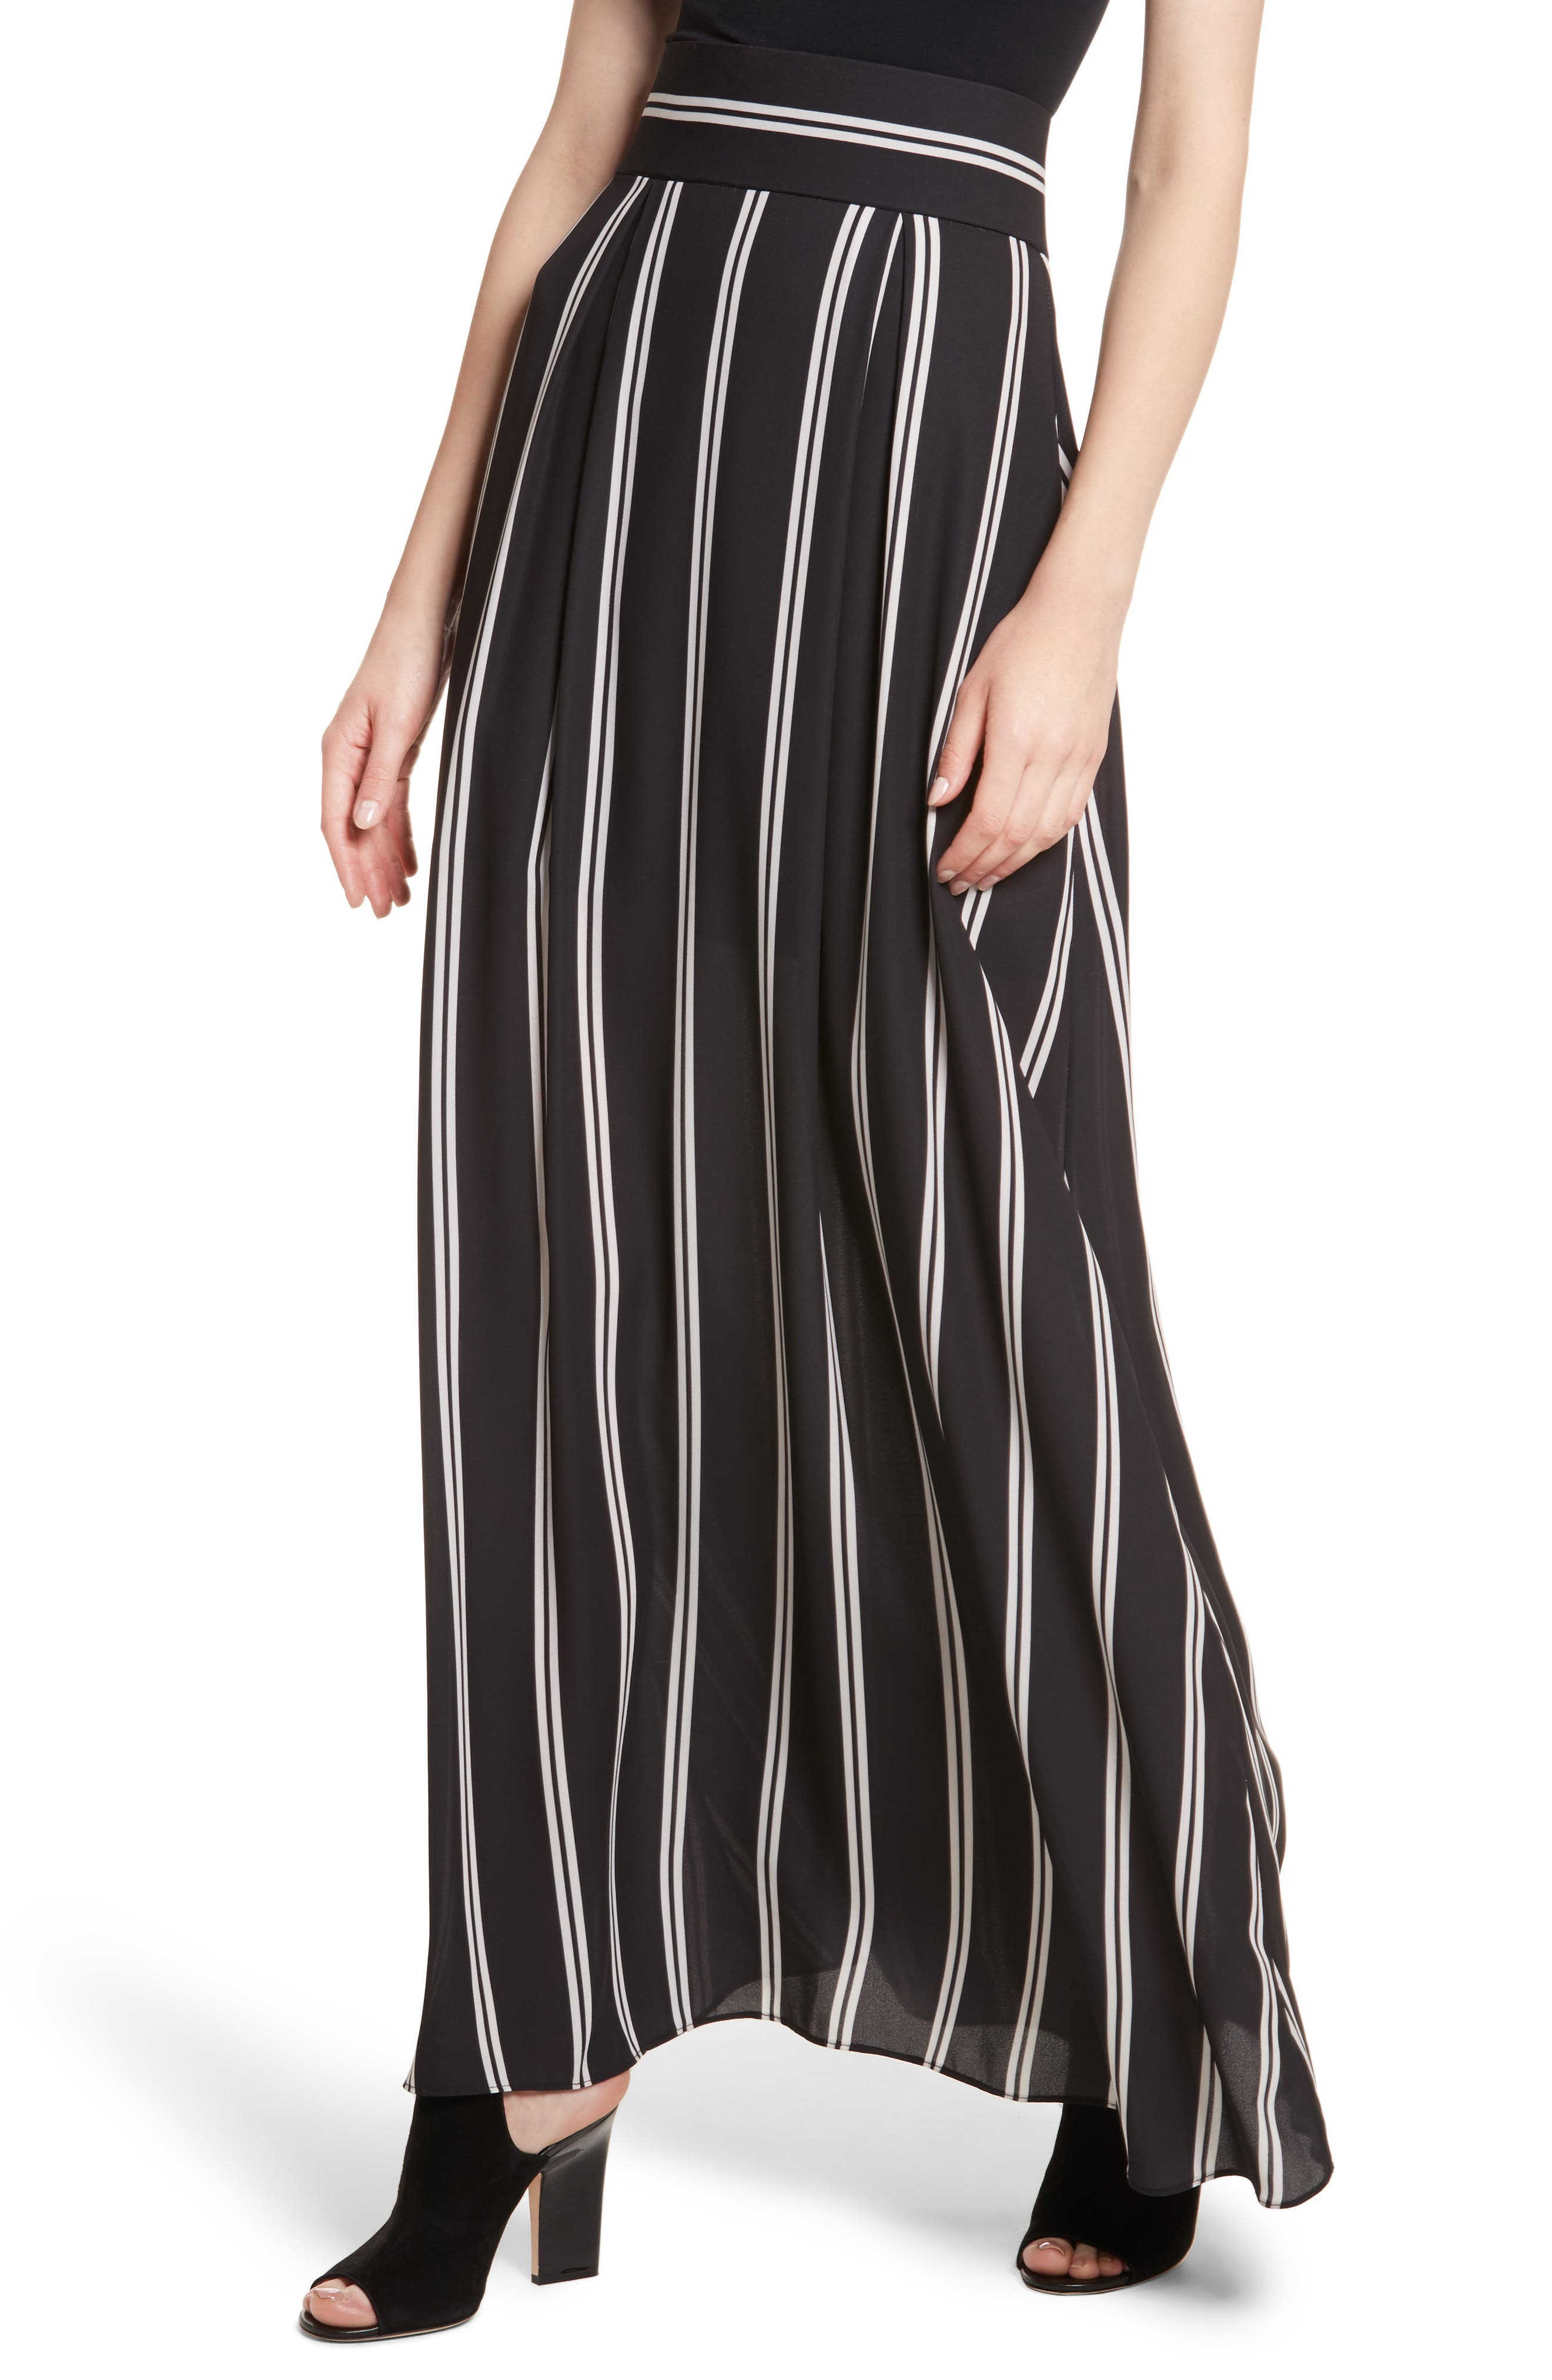 Gabel Clean Pleat Maxi Skirt,                             Alternate thumbnail 4, color,                             002